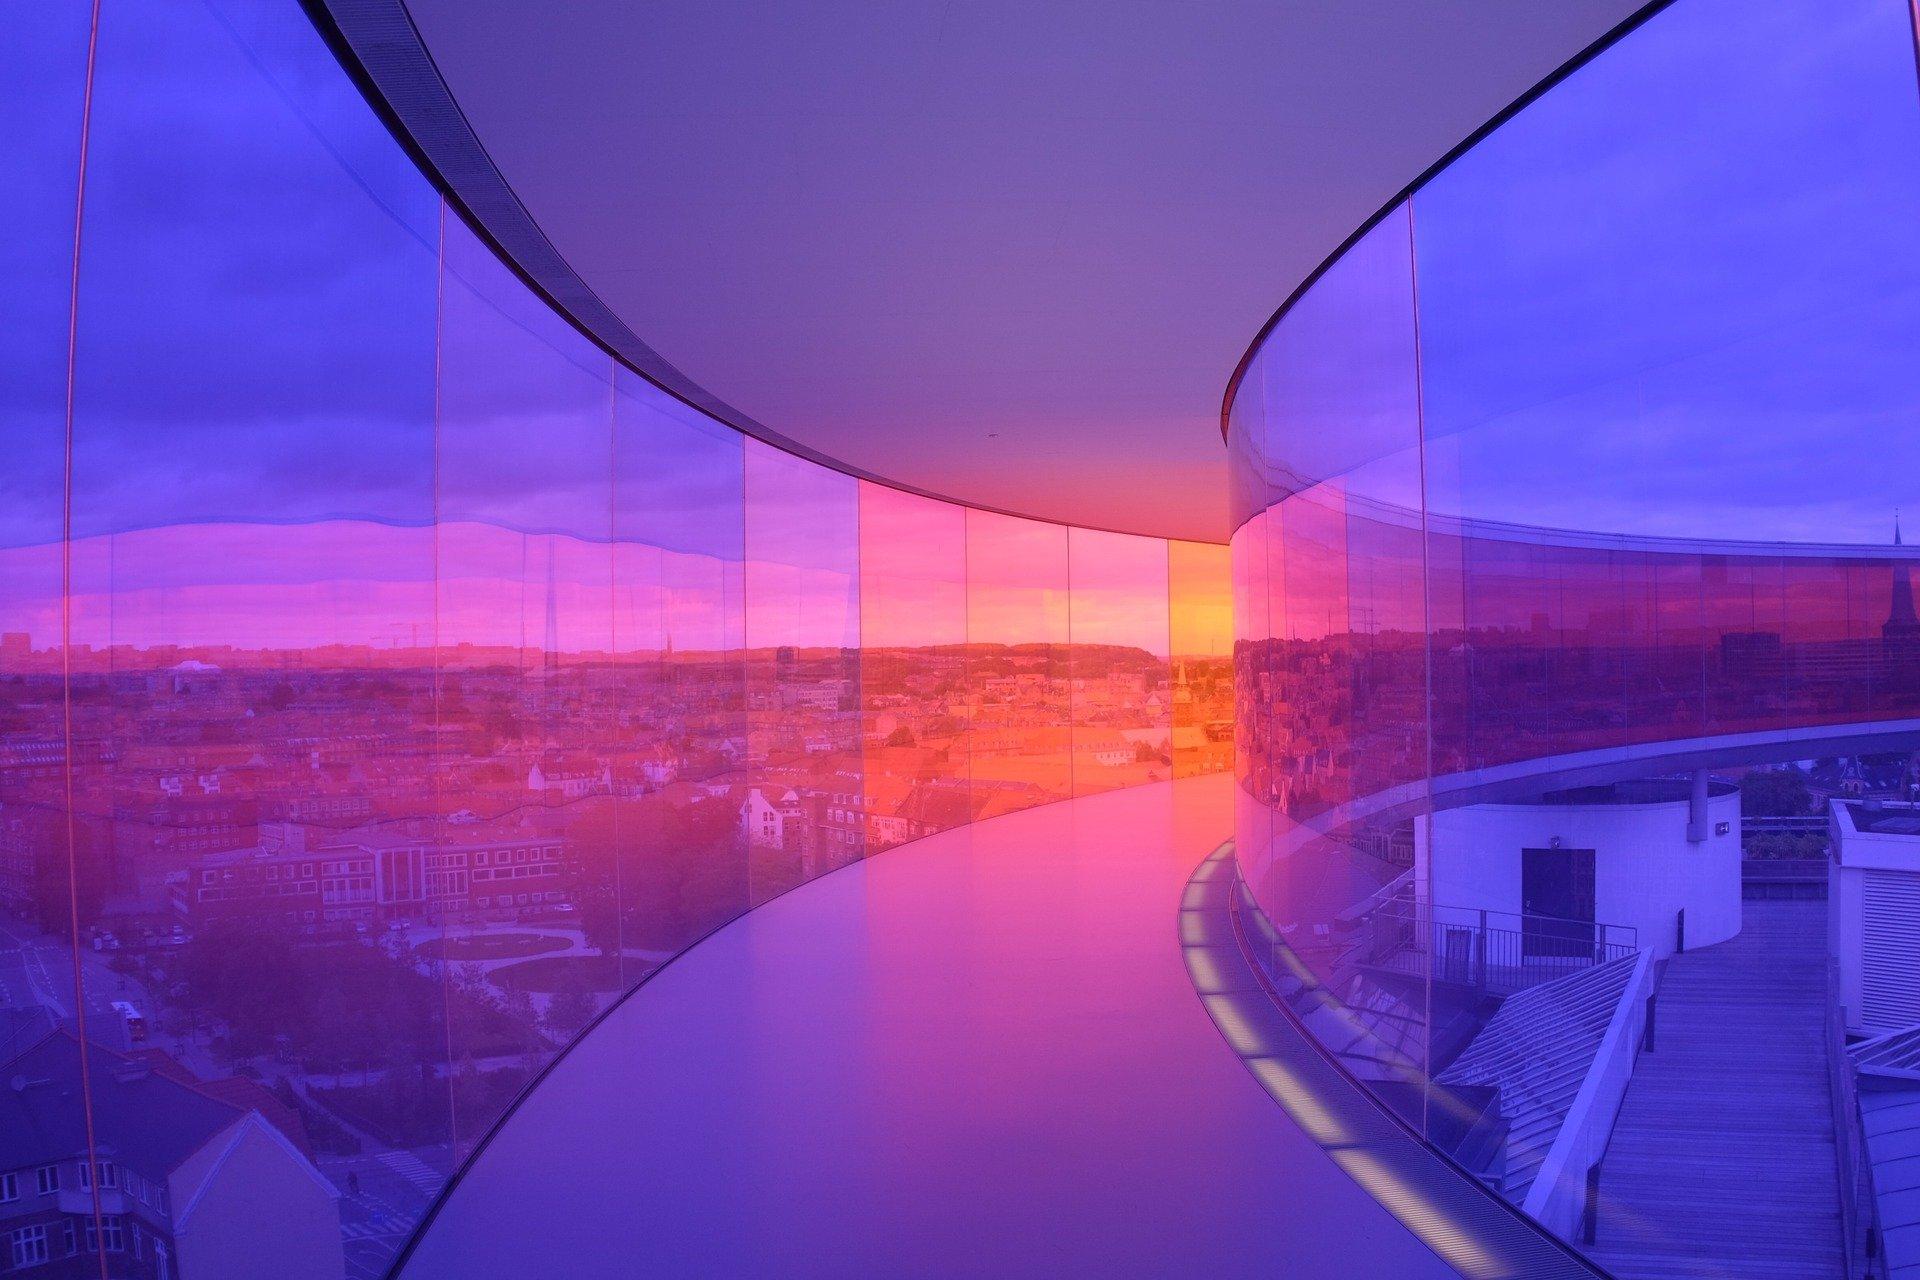 superbonus e sostituzione di pareti a vetri